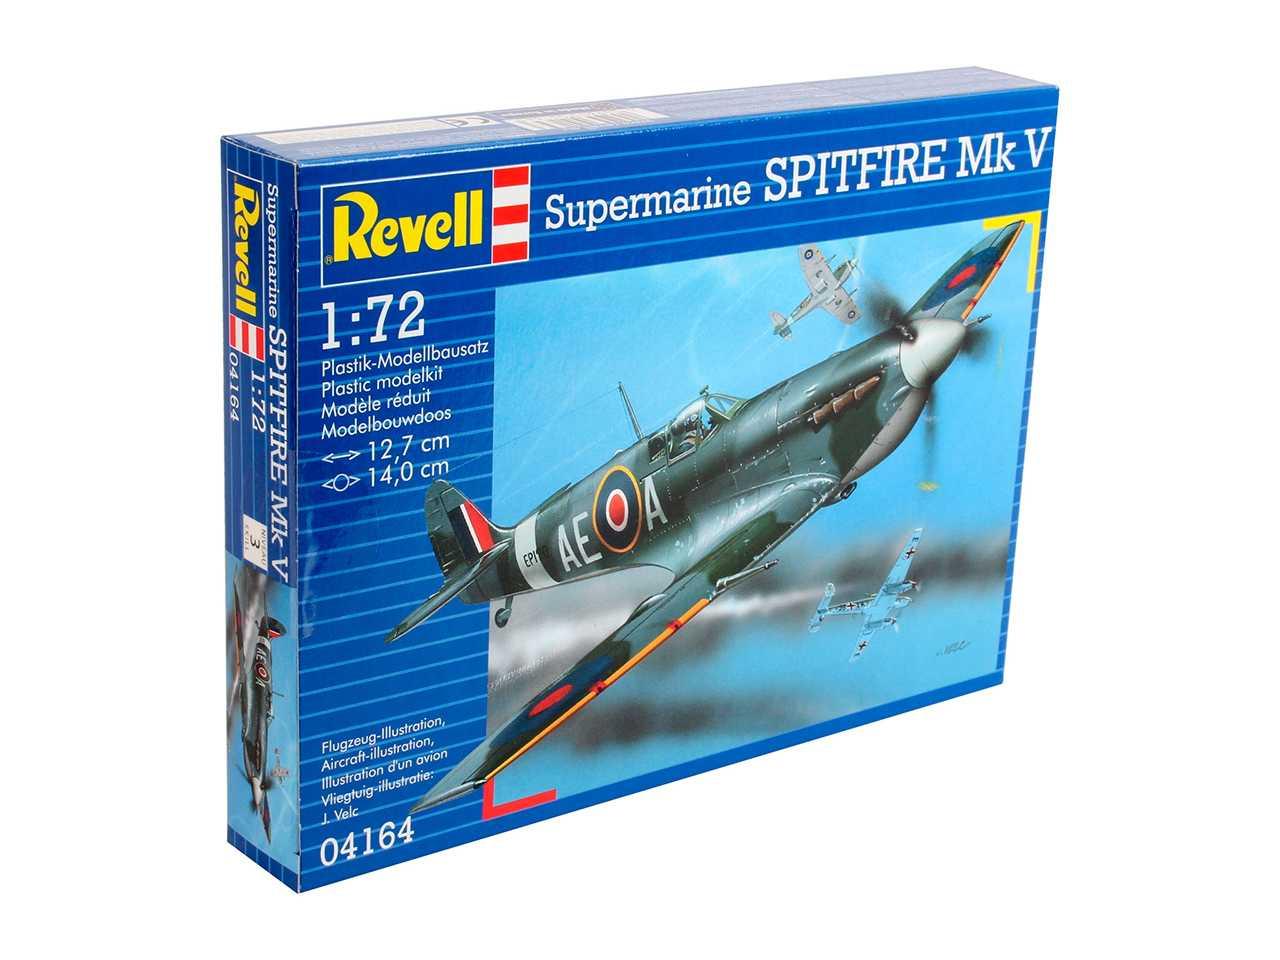 1:72 Supermarine Spitfire Mk V